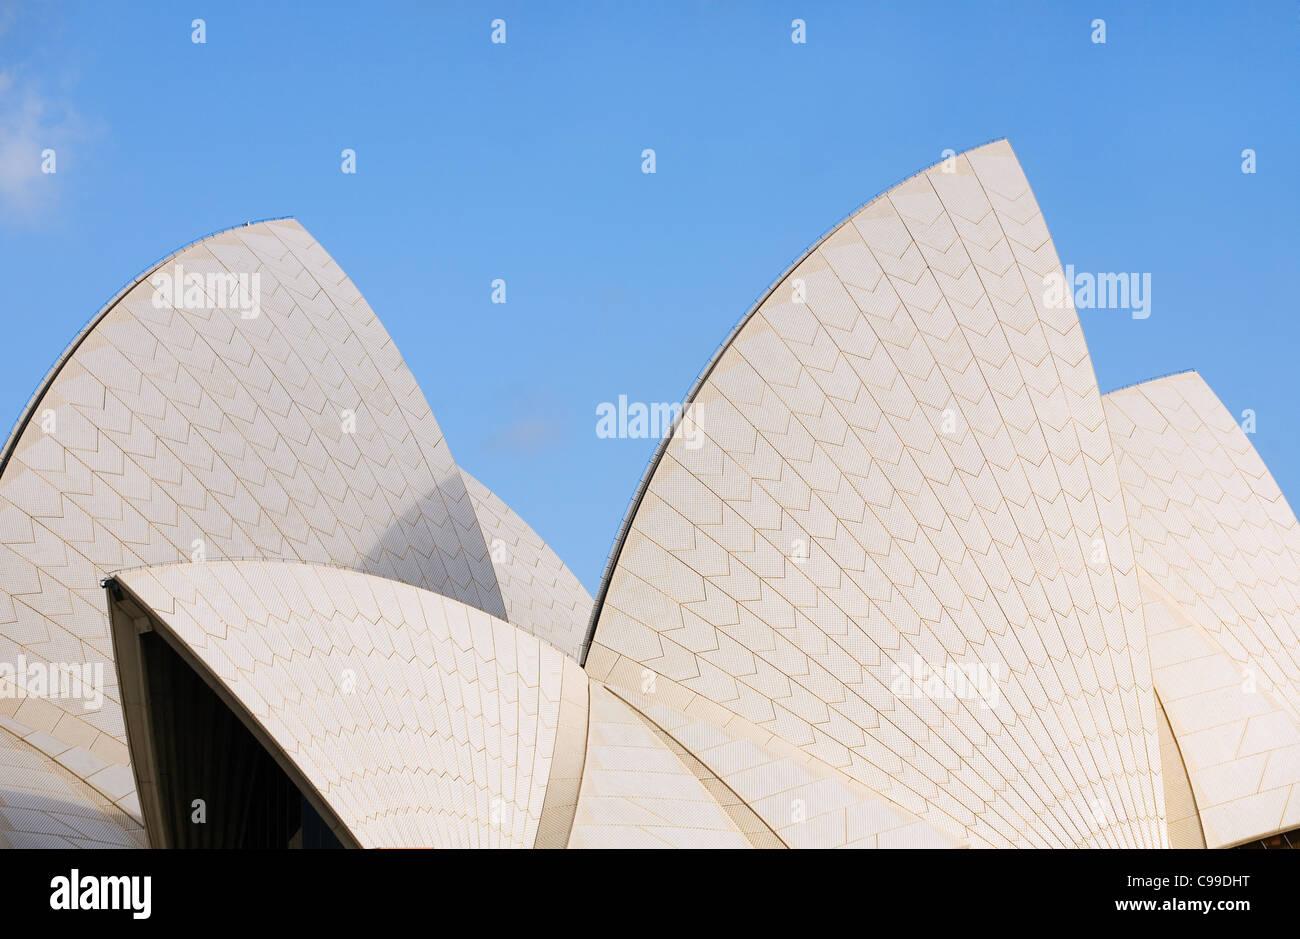 Stock Photo   The Iconic Architecture Of The Sydney Opera House. Sydney,  New South Wales, Australia